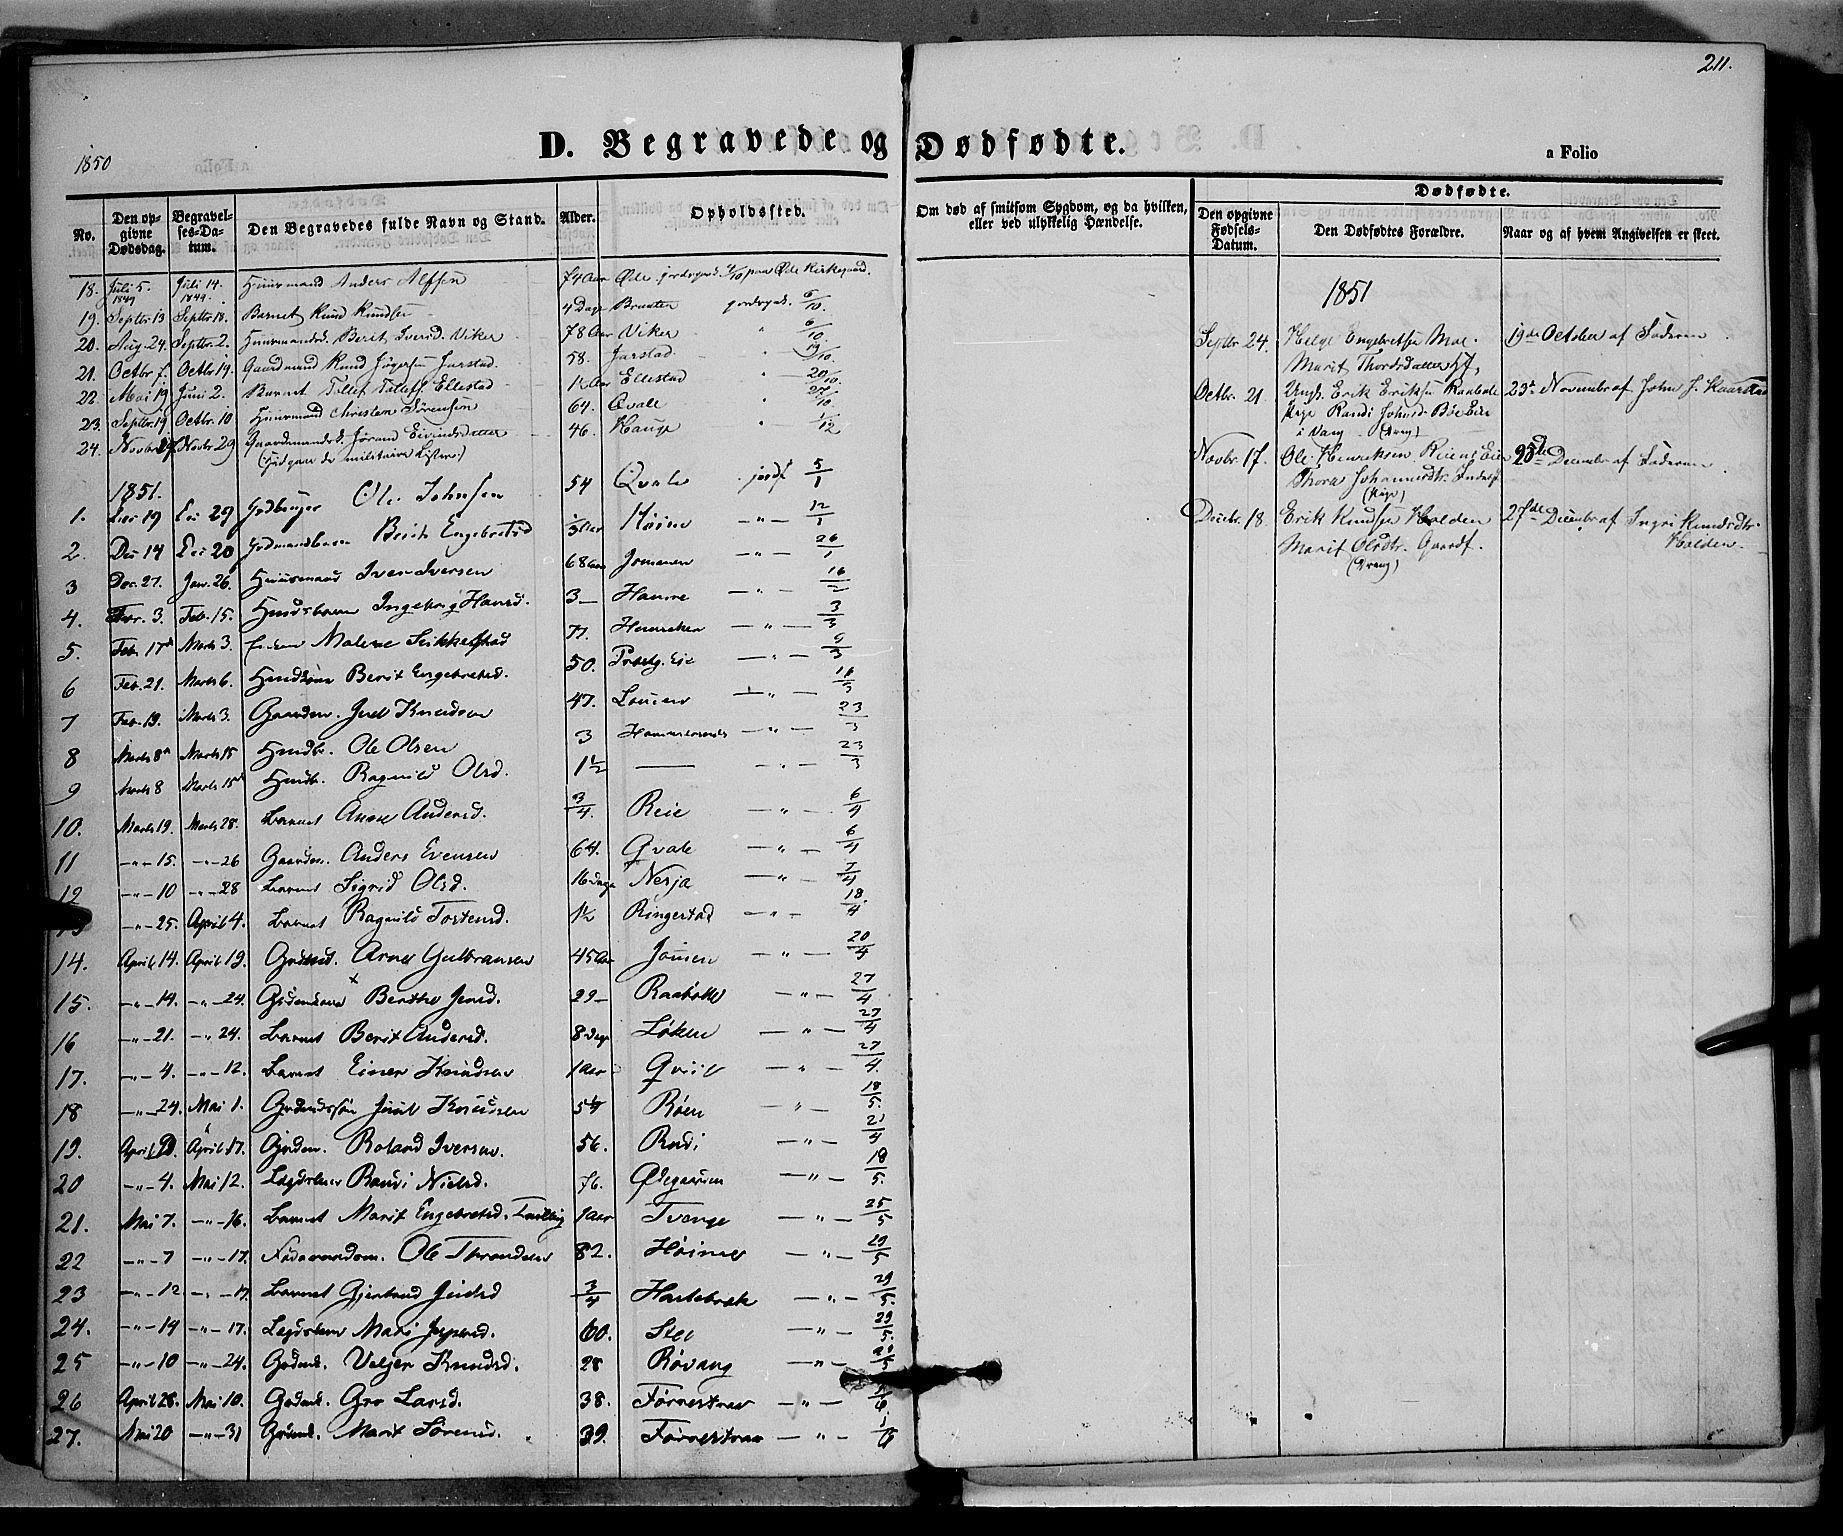 SAH, Vestre Slidre prestekontor, Ministerialbok nr. 1, 1844-1855, s. 211